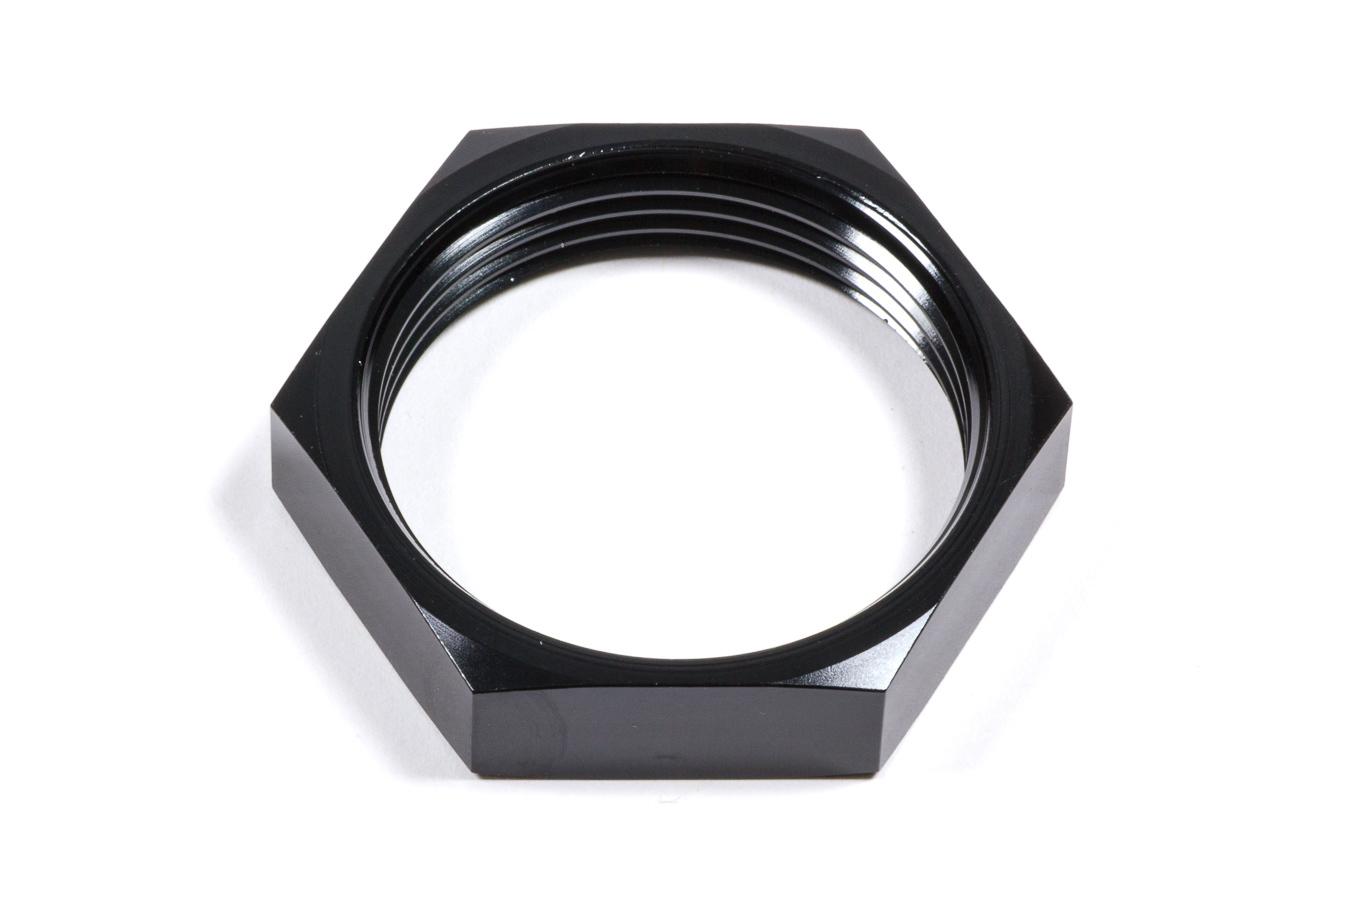 Triple X Race Components HF-72020-BLK Bulkhead Fitting Nut, 20 AN, Aluminum, Black Anodize, Each